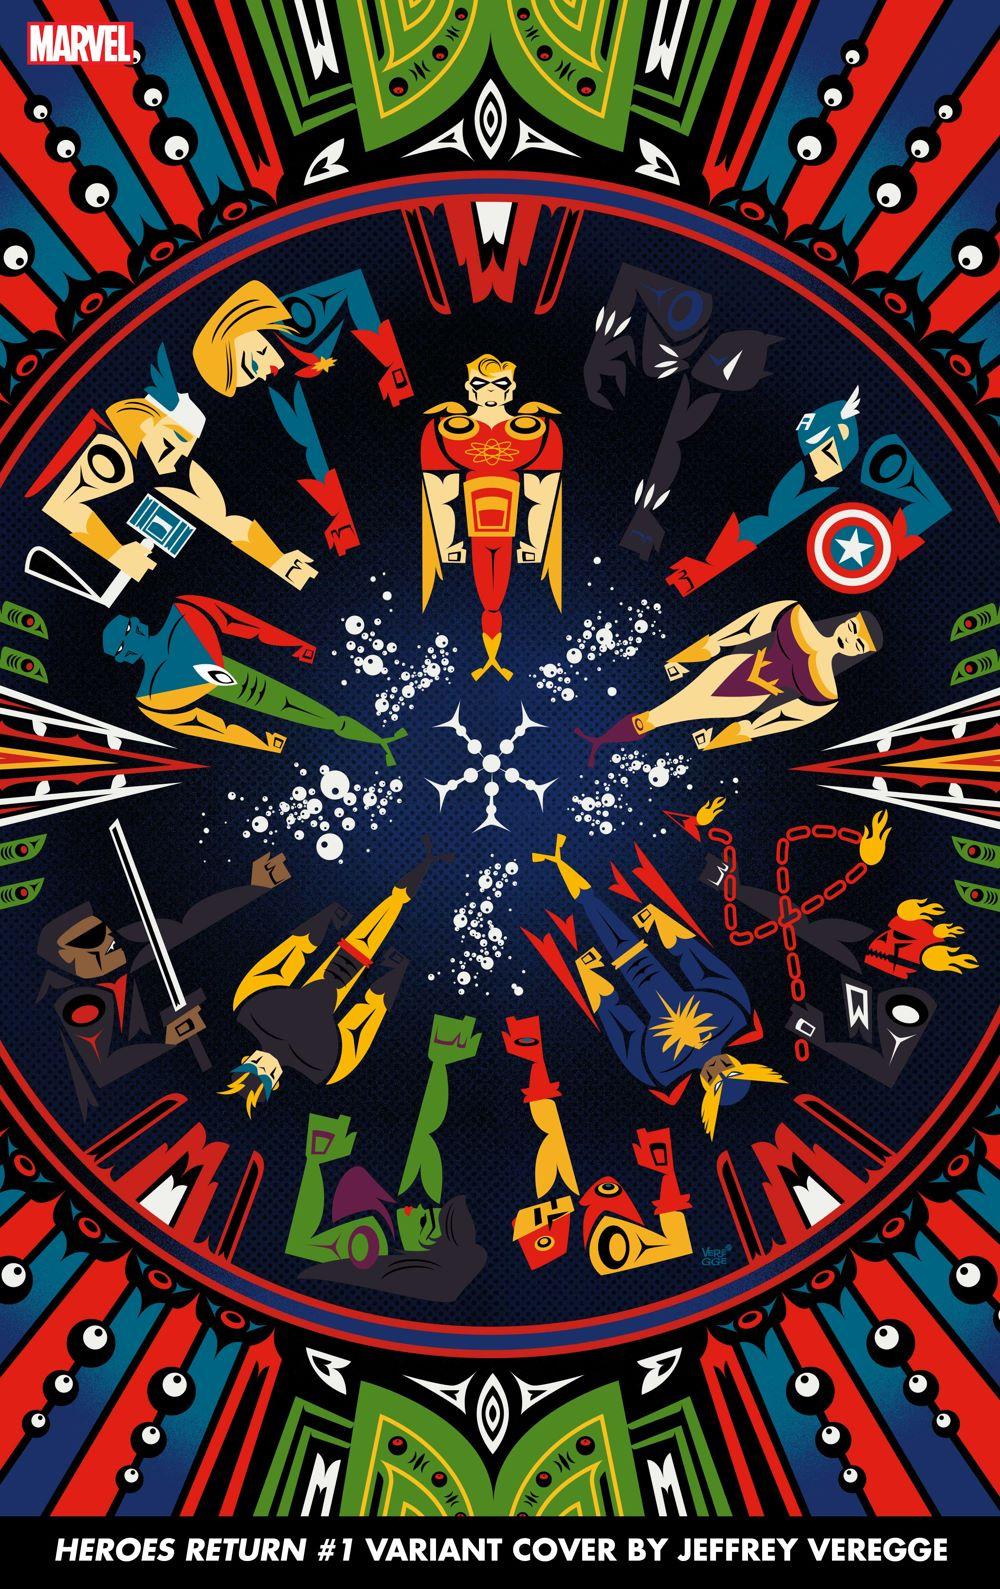 HEROESRETURN2021001_Veregge Marvel unleashes the final Jeffrey Veregge HEROES REBORN variant covers